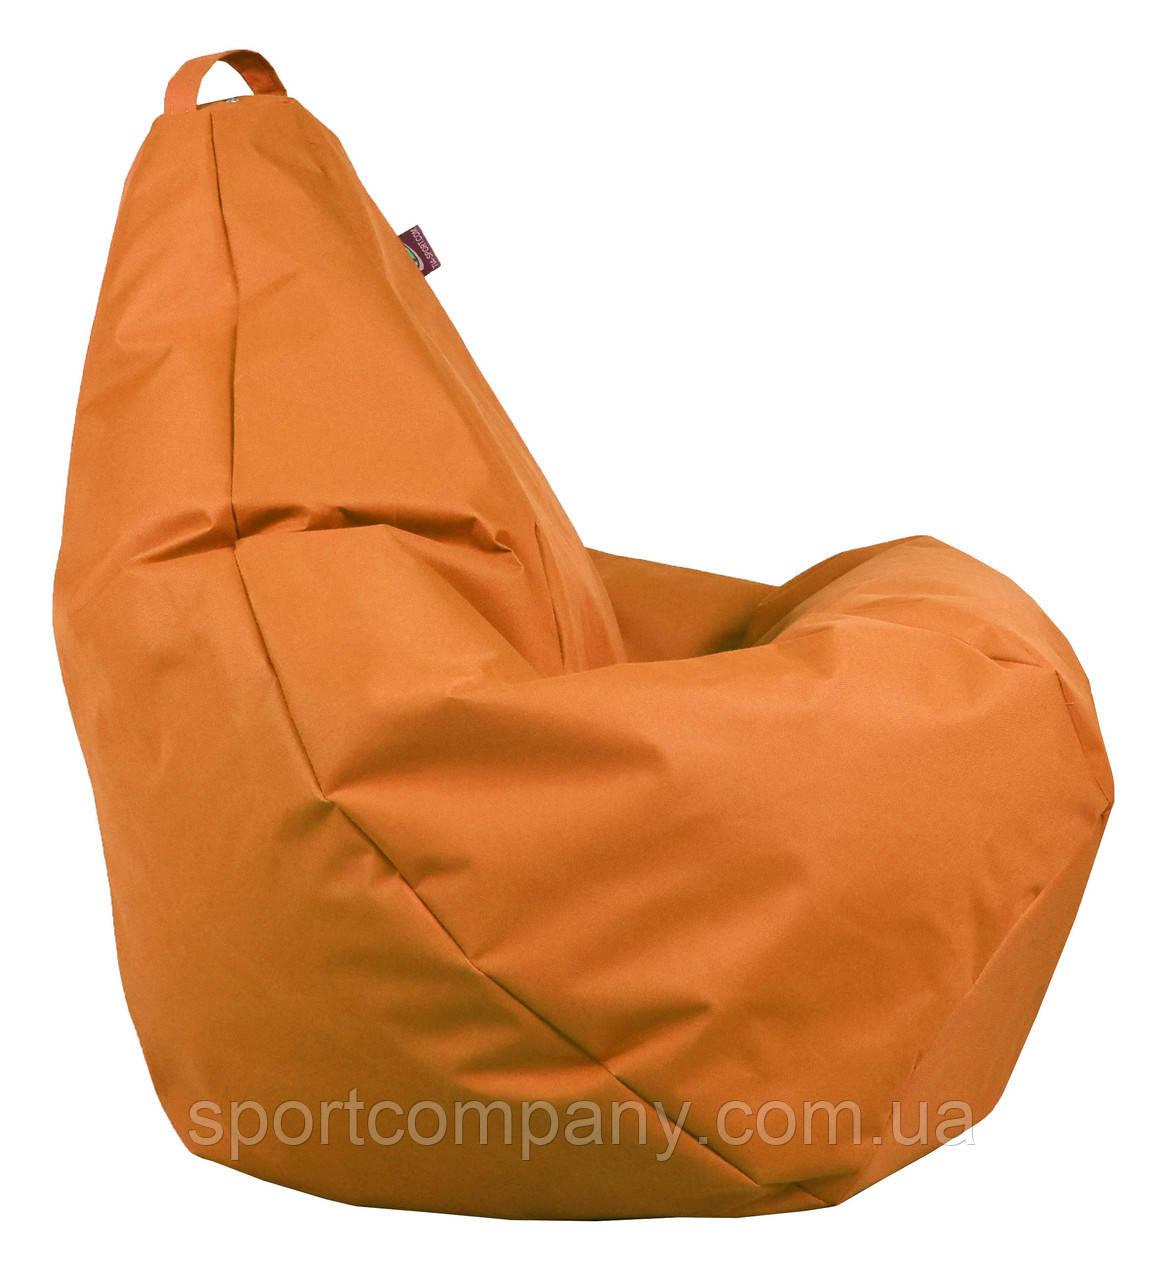 Кресло груша Оксфорд Оранж TIA-SPORT